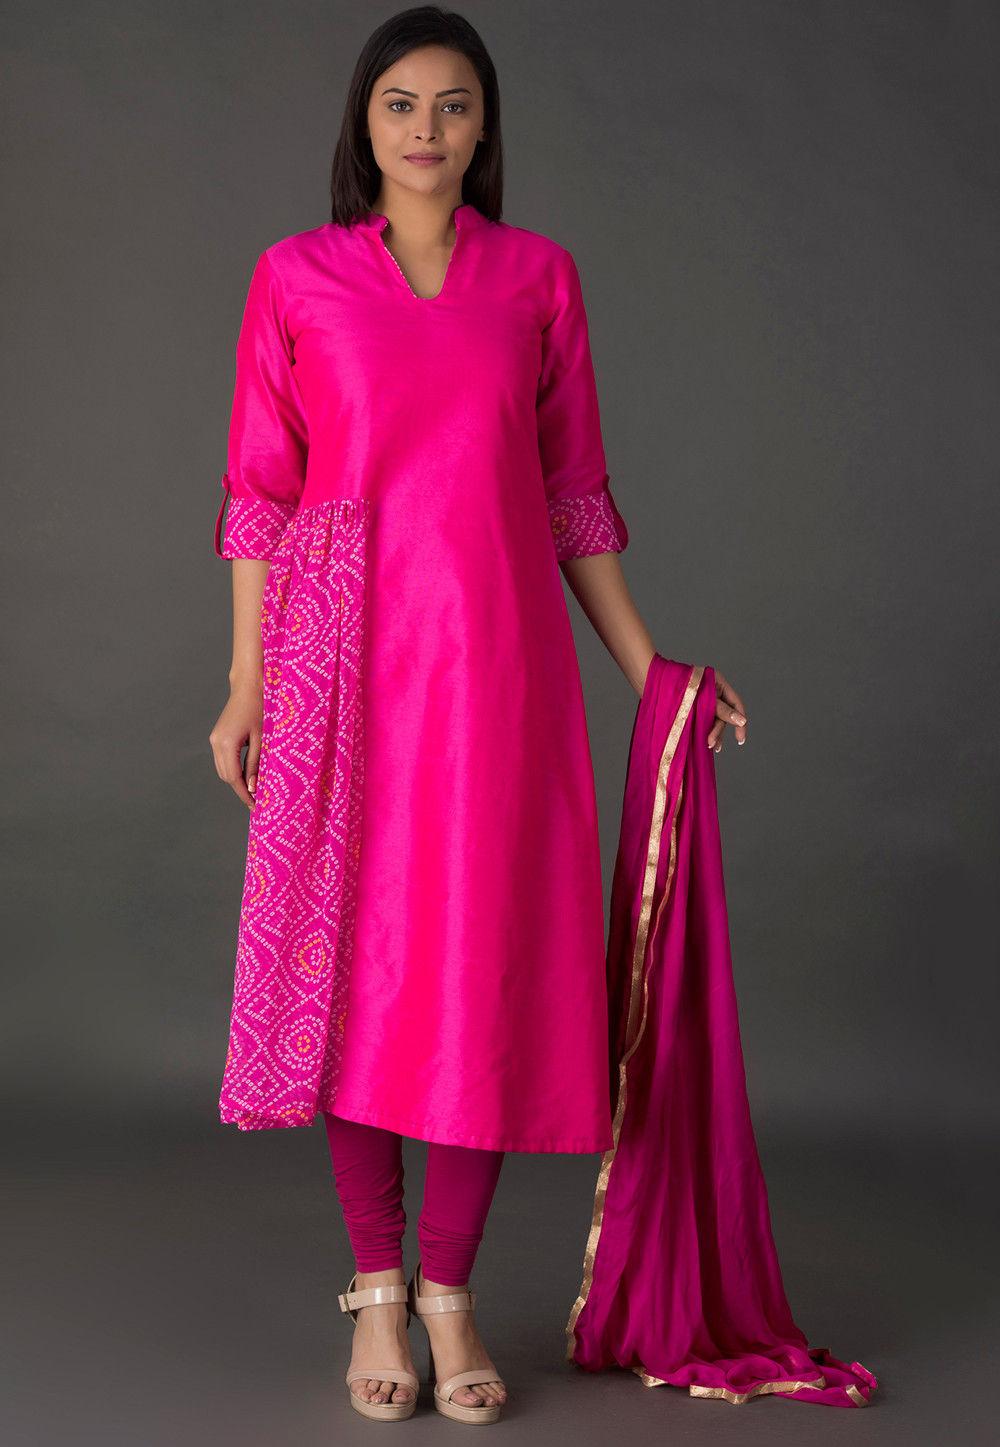 Bandhej Printed Dupion Silk A Line Suit in Fuchsia